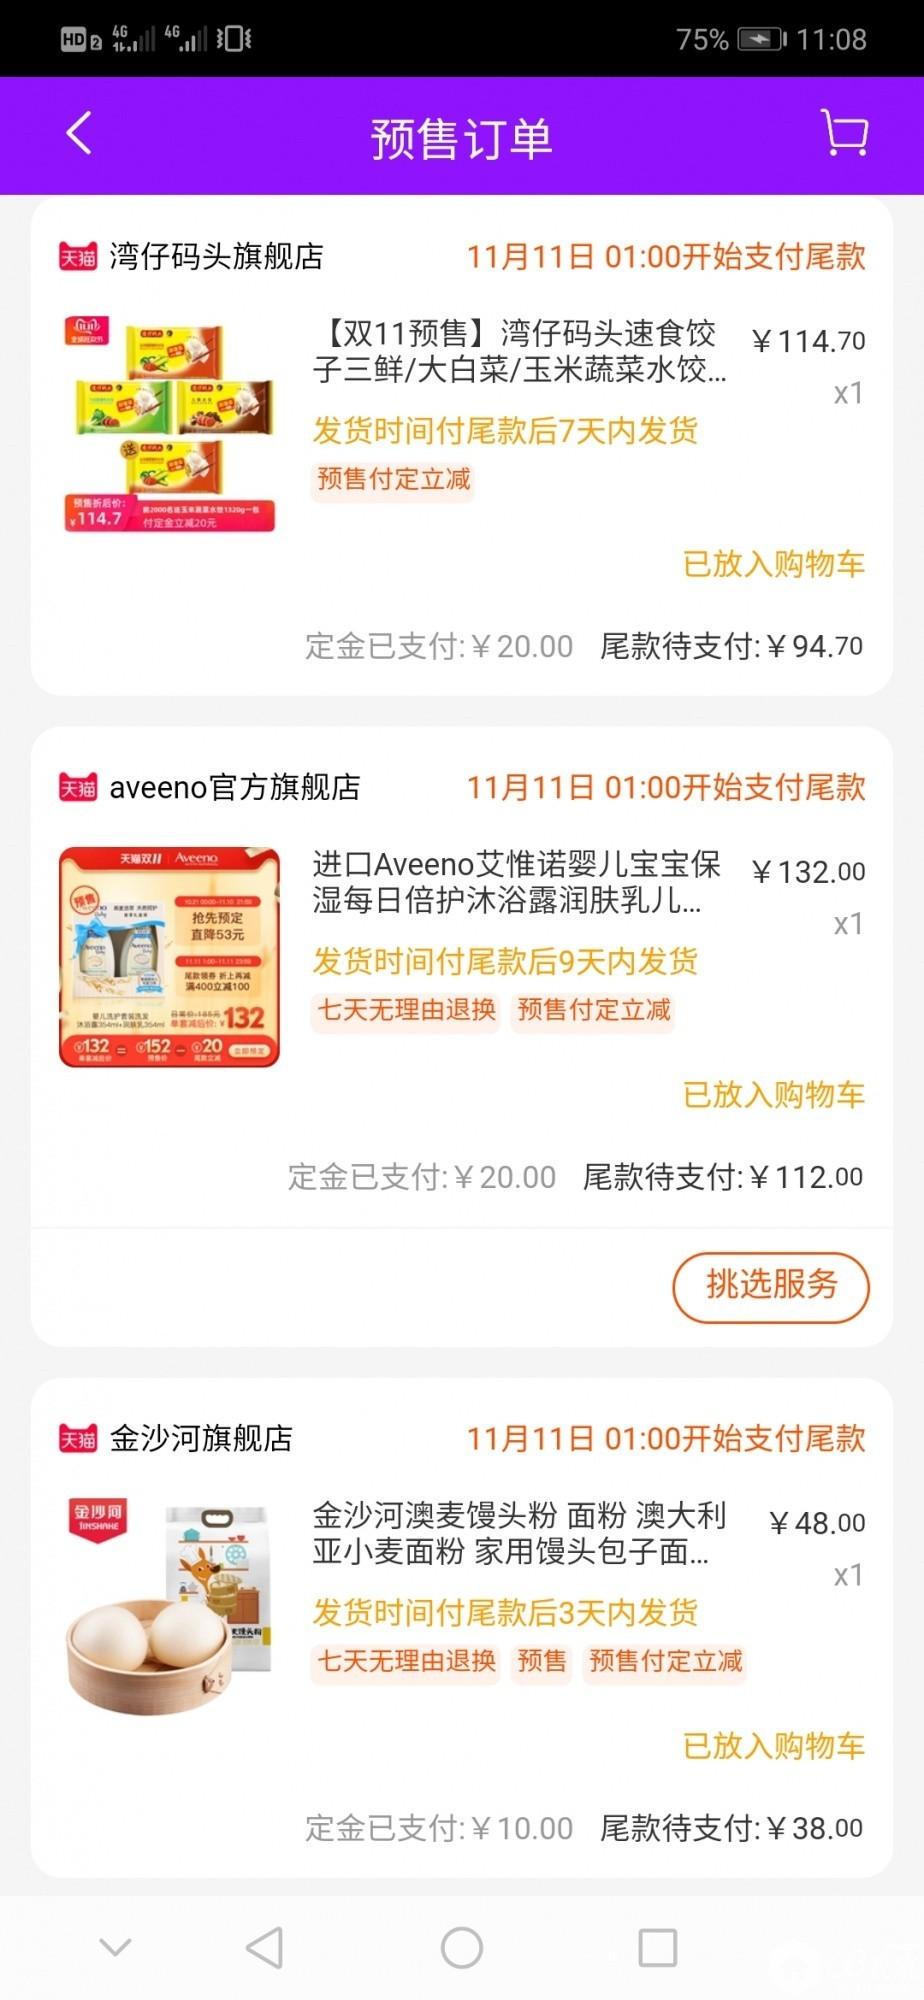 Screenshot_20191031_230804_com.taobao.taobao.jpg